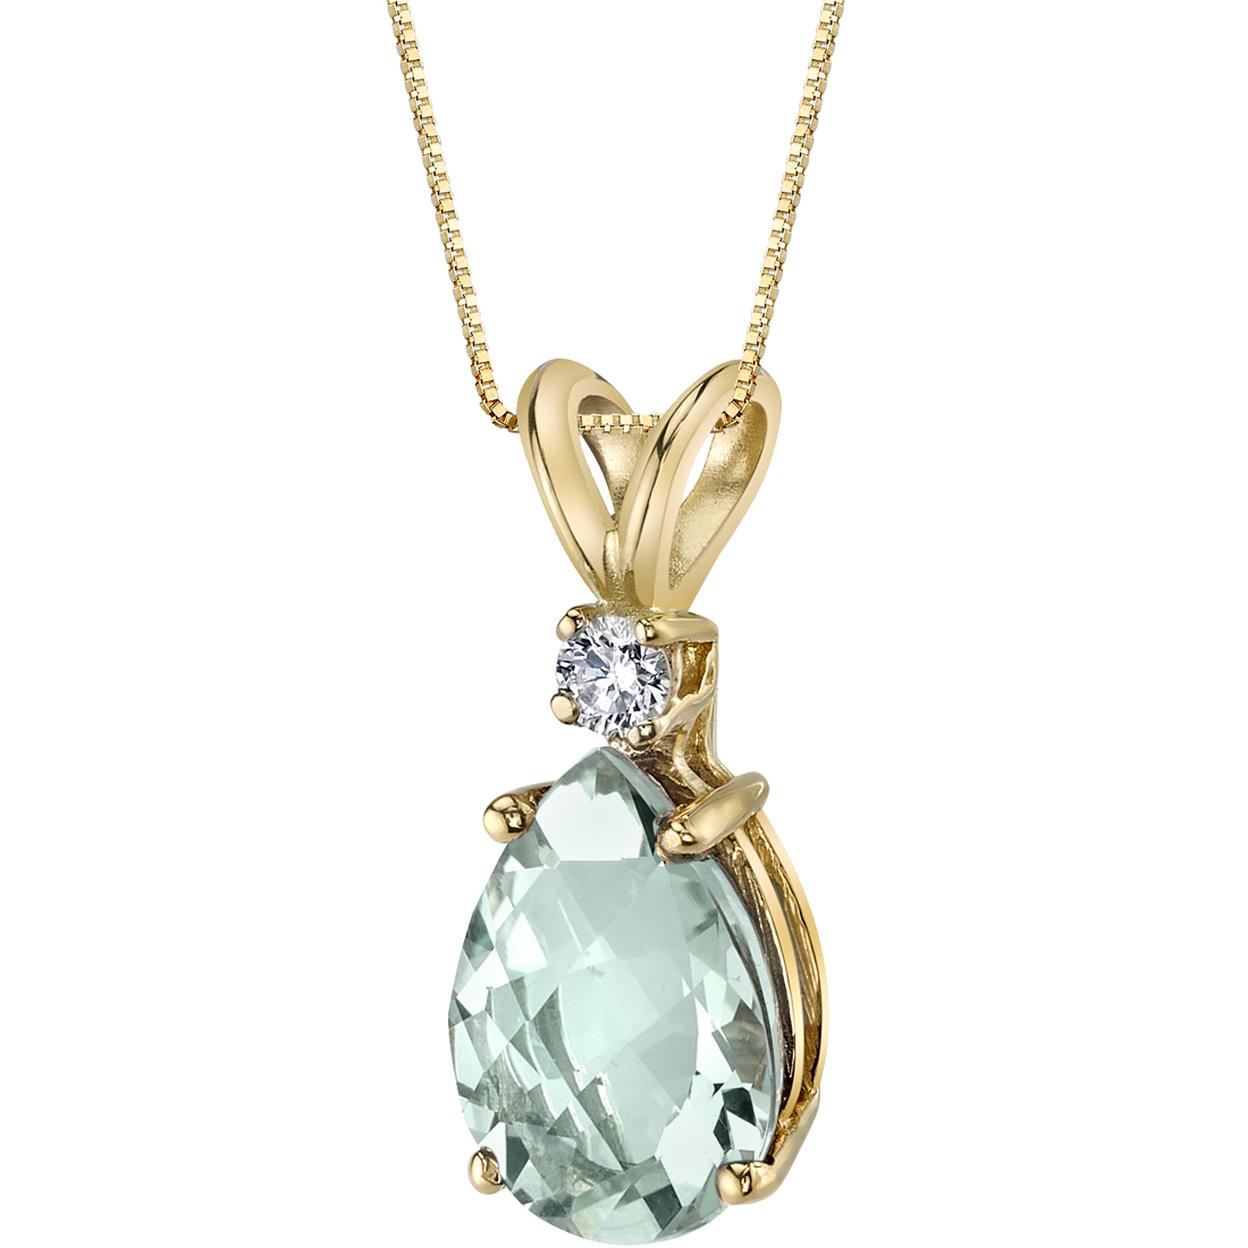 Oravo 14 Karat Yellow Gold Pear Shape 1.50 Carats Green Amethyst Diamond Pendant